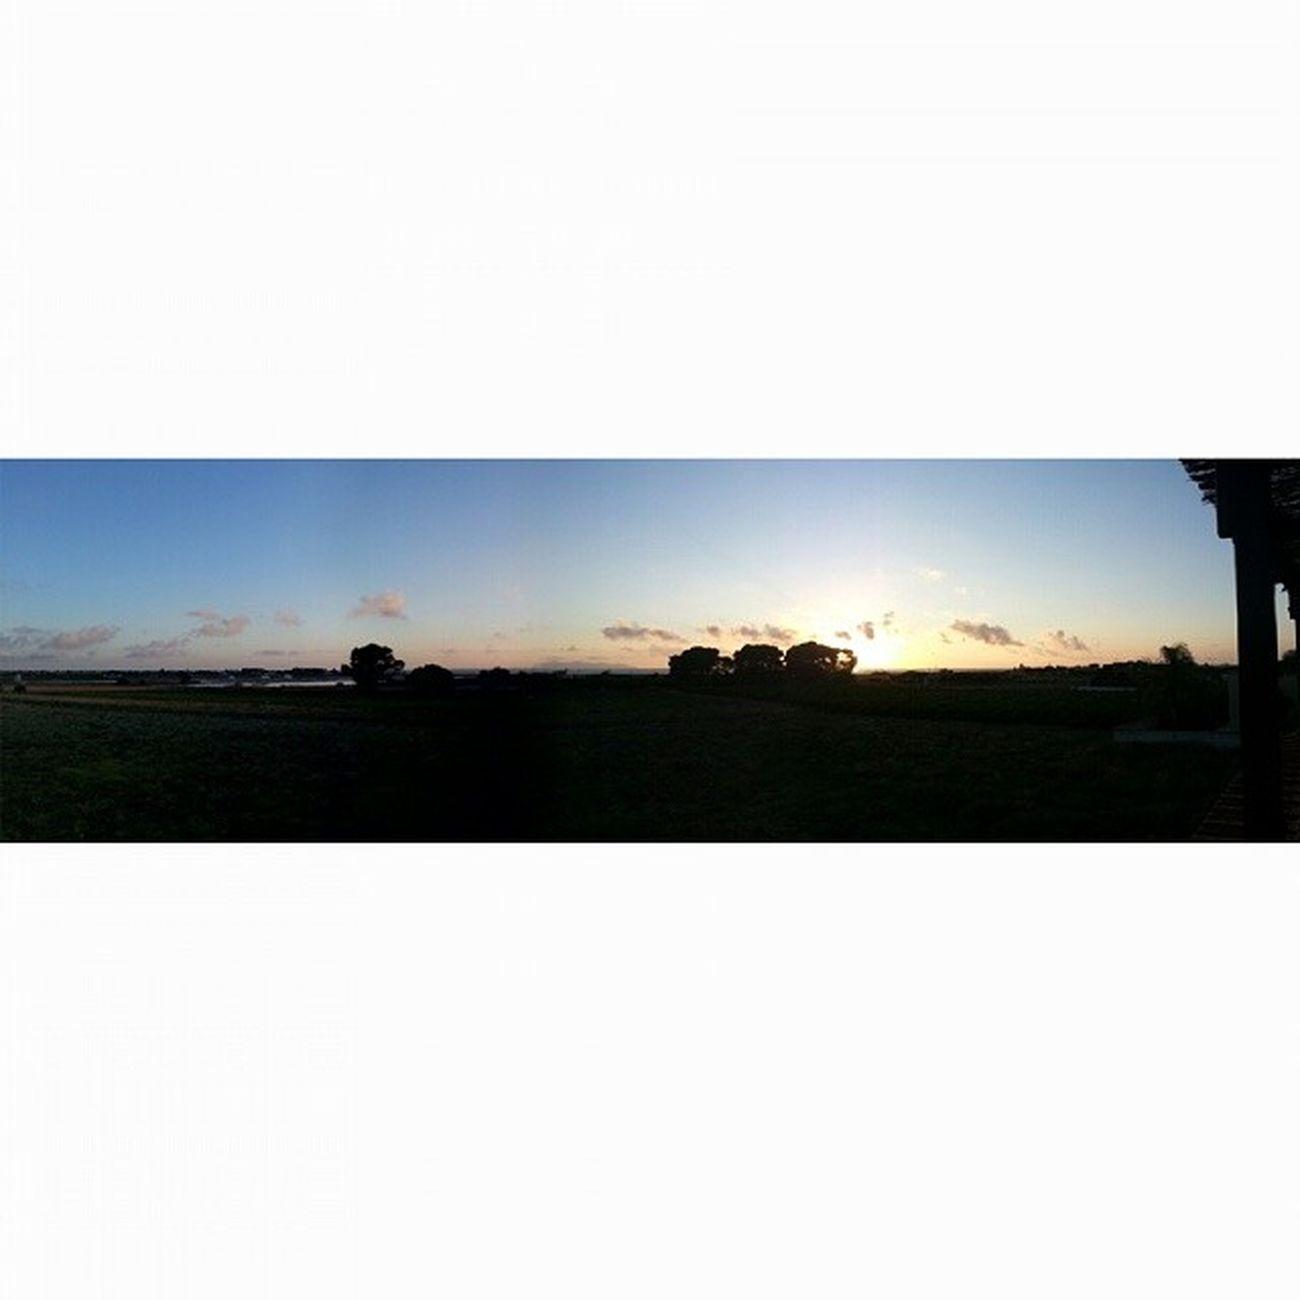 Nubia (: Nubia Conamici Home Sweet mangiata sky beautiful bellissimo tramonto sera imfine